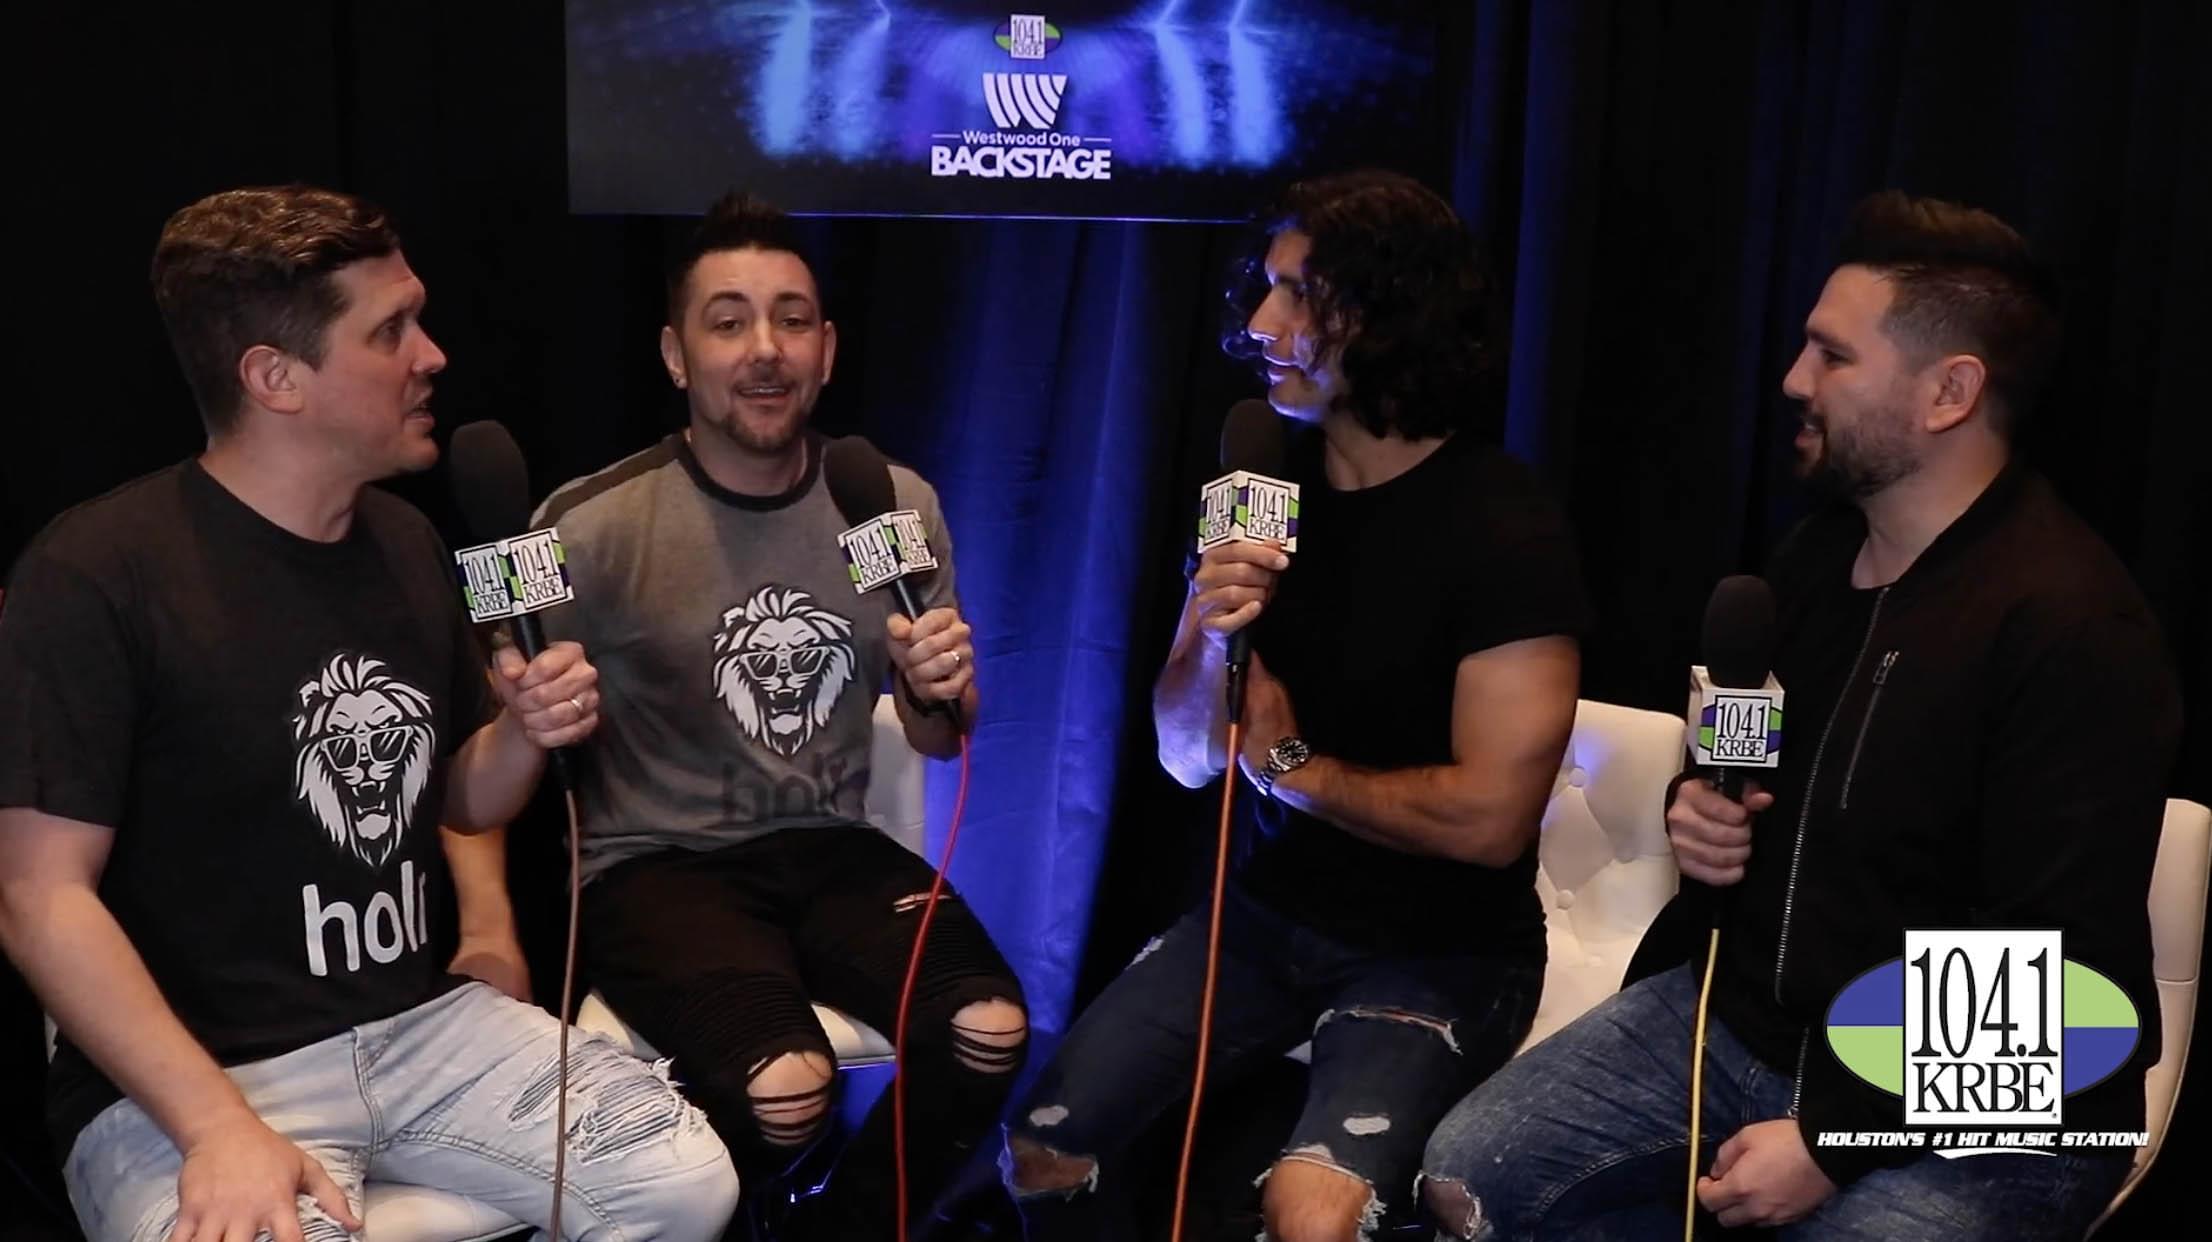 Special K & Kevin Quinn interview Dan & Shay at the 2019 BBMAs